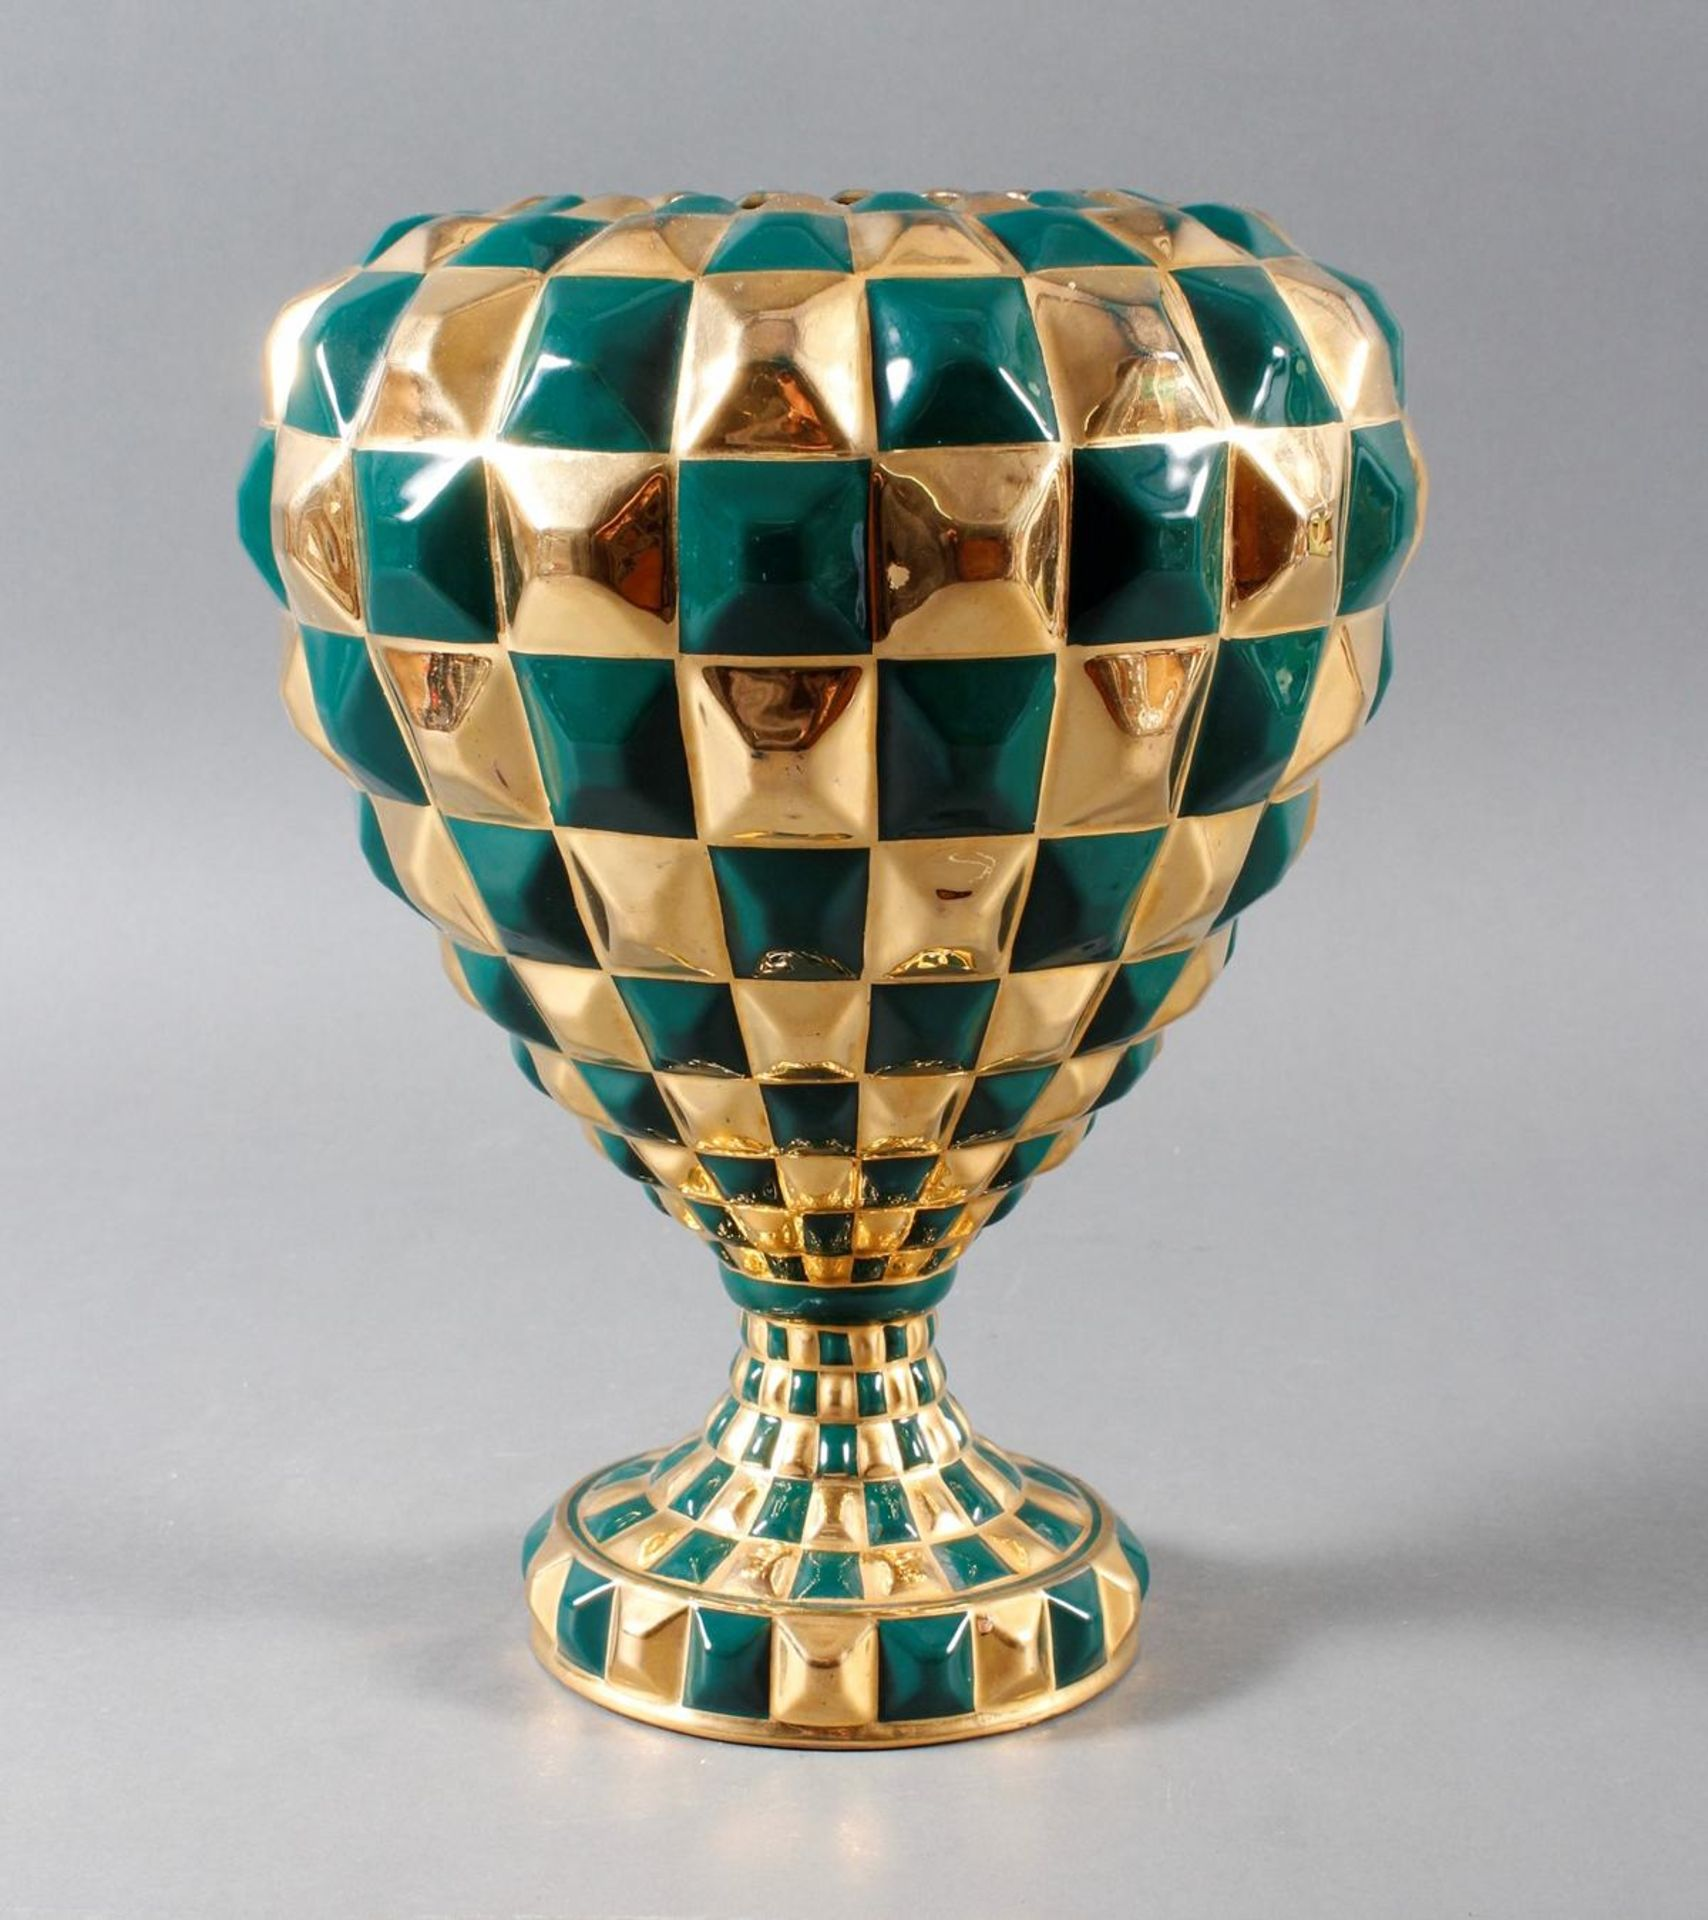 Designer-Keramikvase, wohl 1960er Jahre